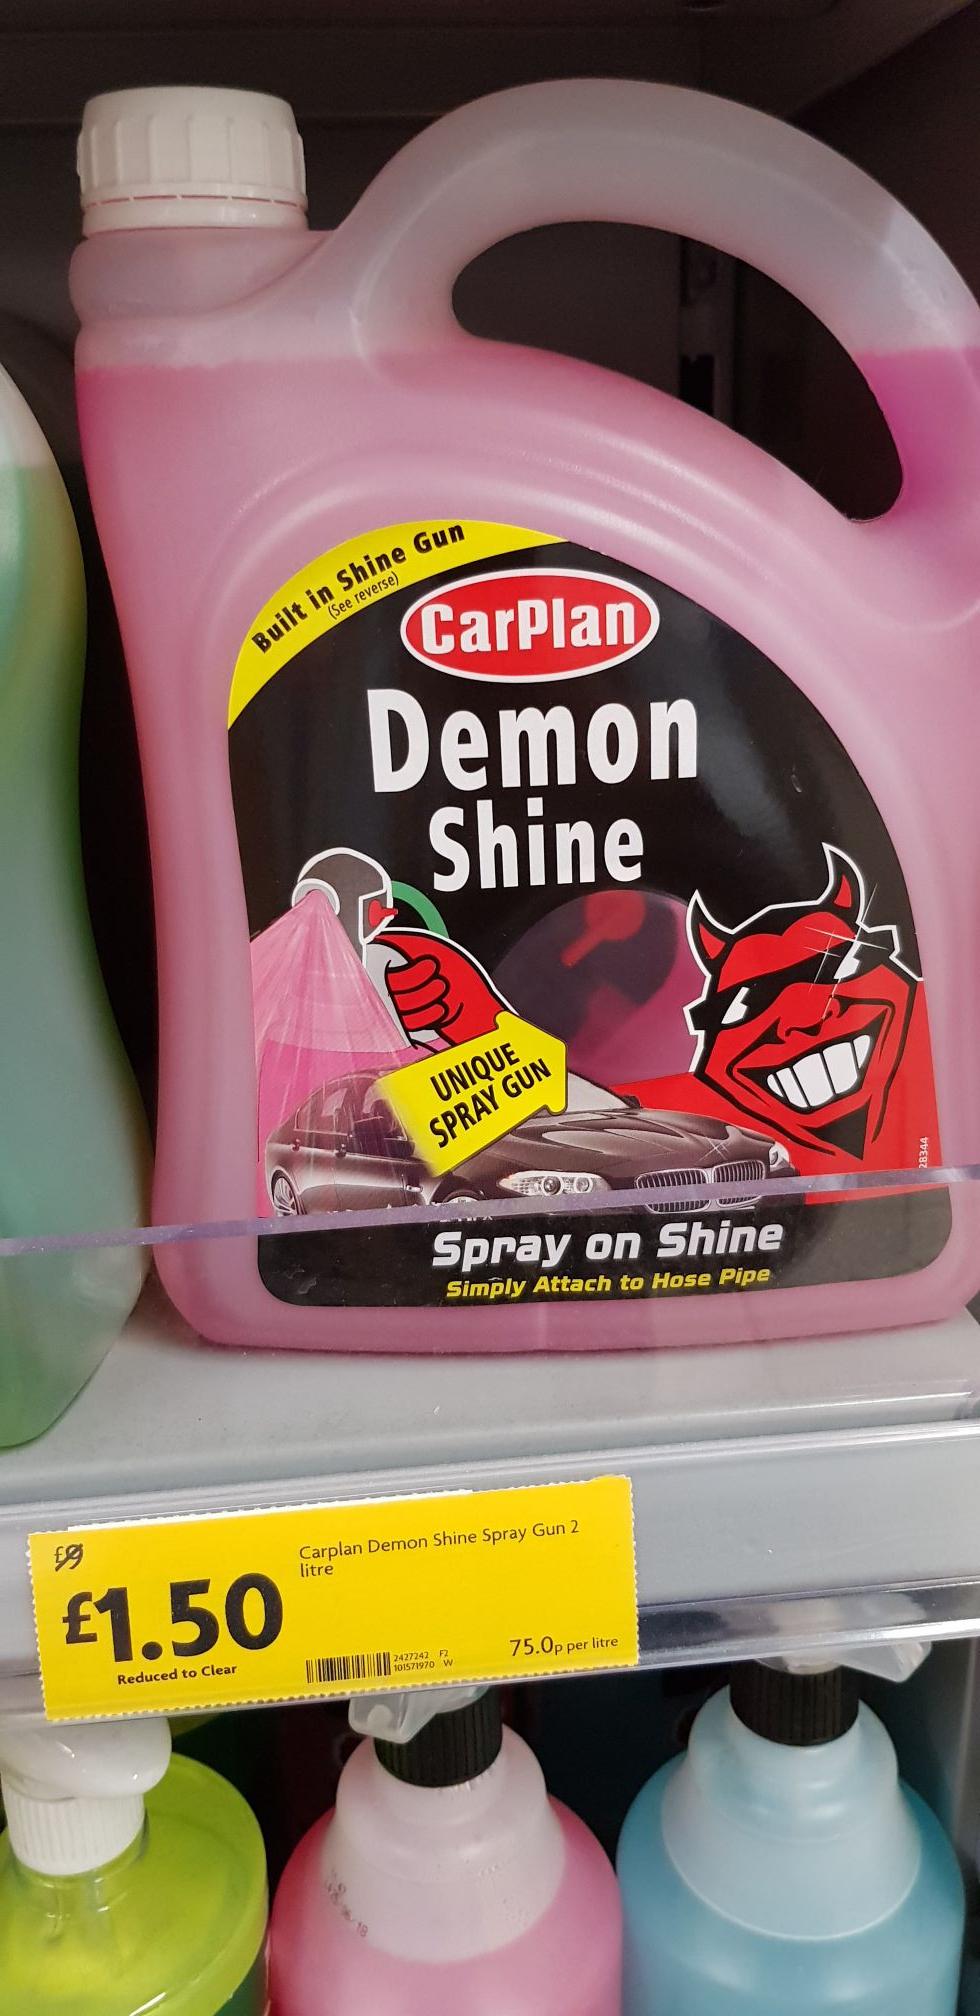 Car plan 2litre  Demon shine in-store Morrison's for £1.50